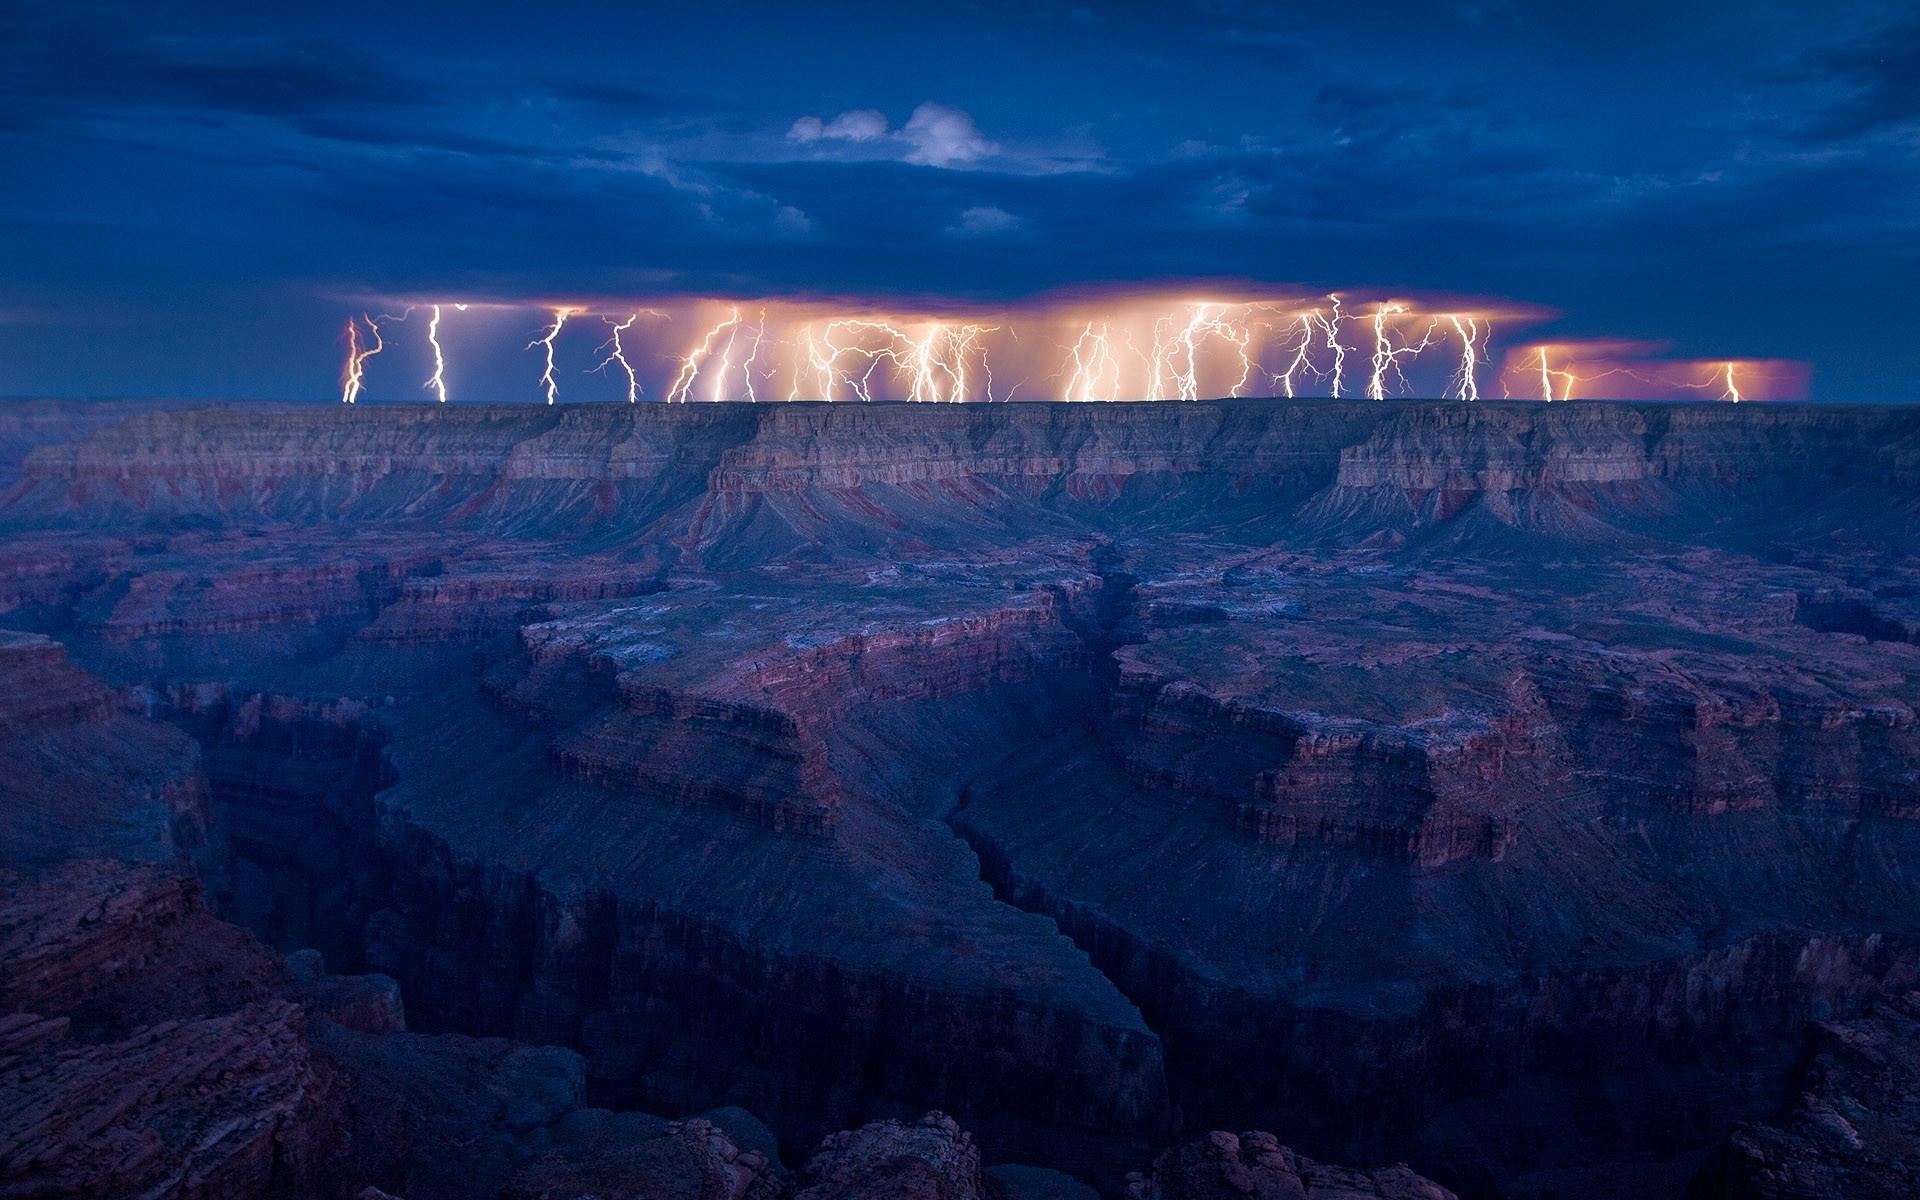 Thunderstorm Wallpaper 2560x1600px #905088